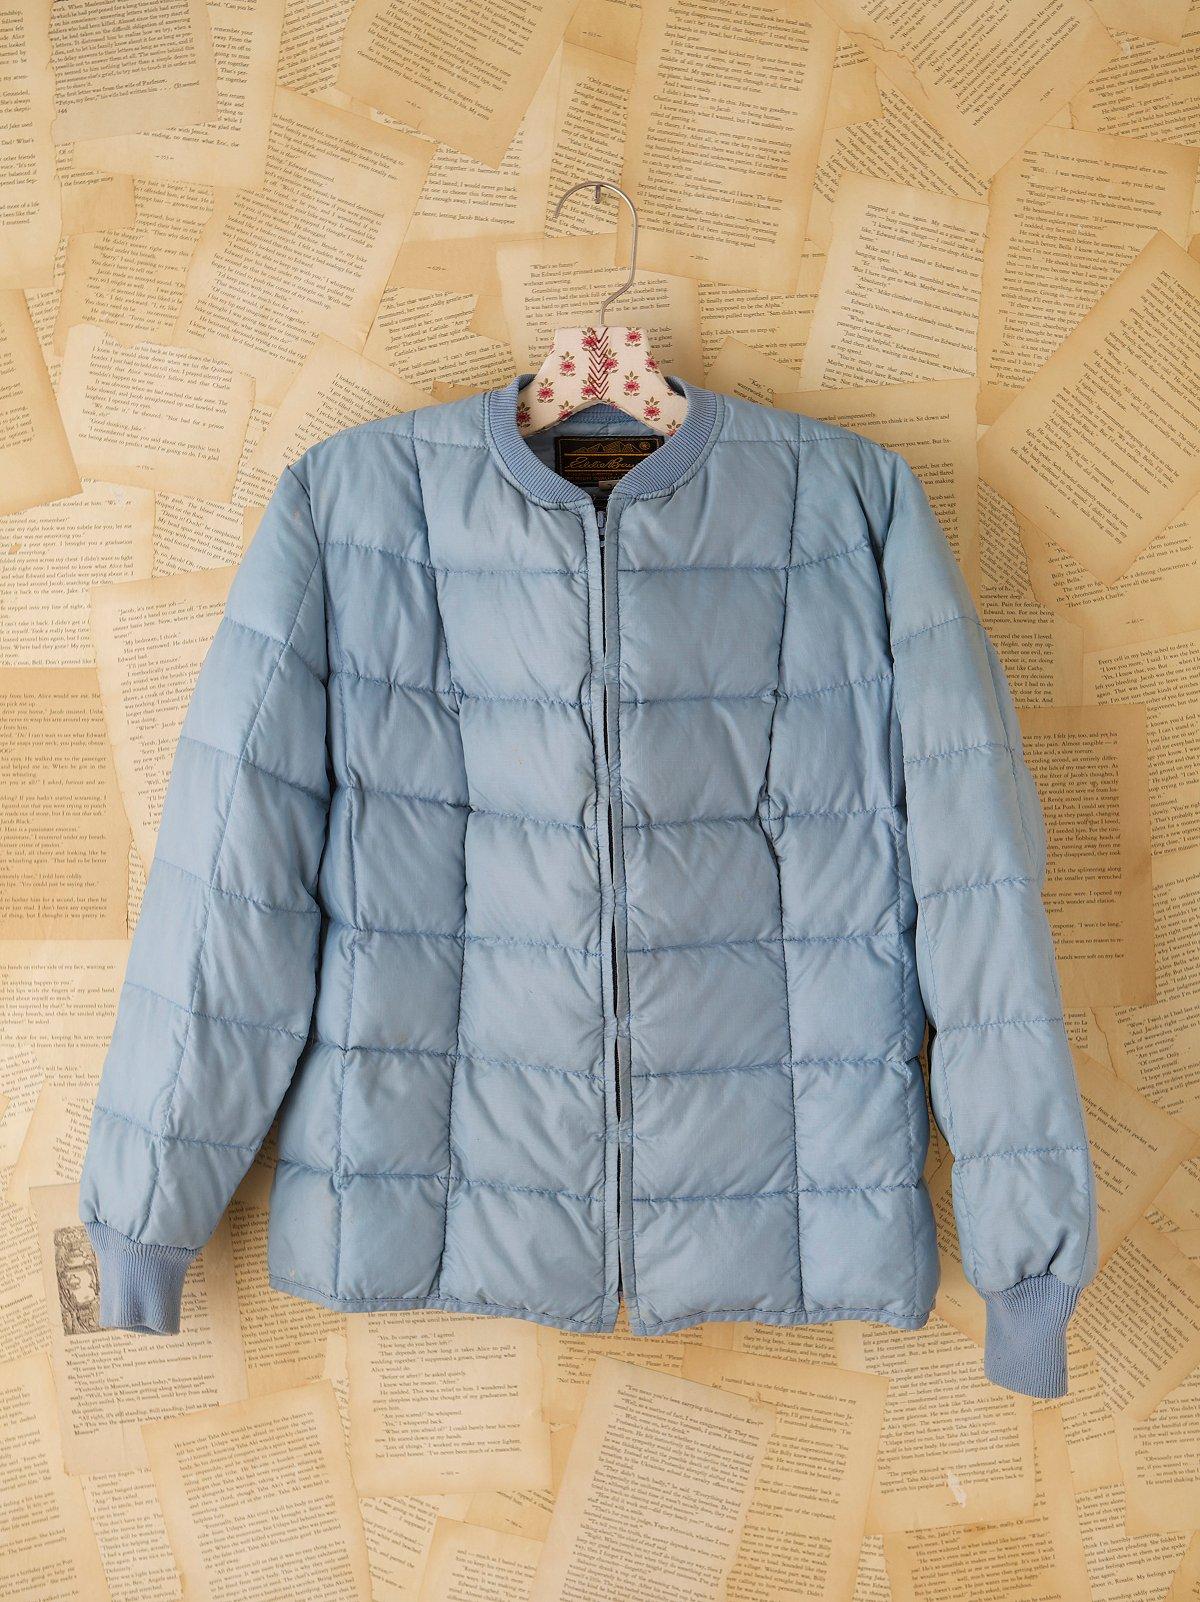 Vintage Eddie Bauer Goose Down Jacket